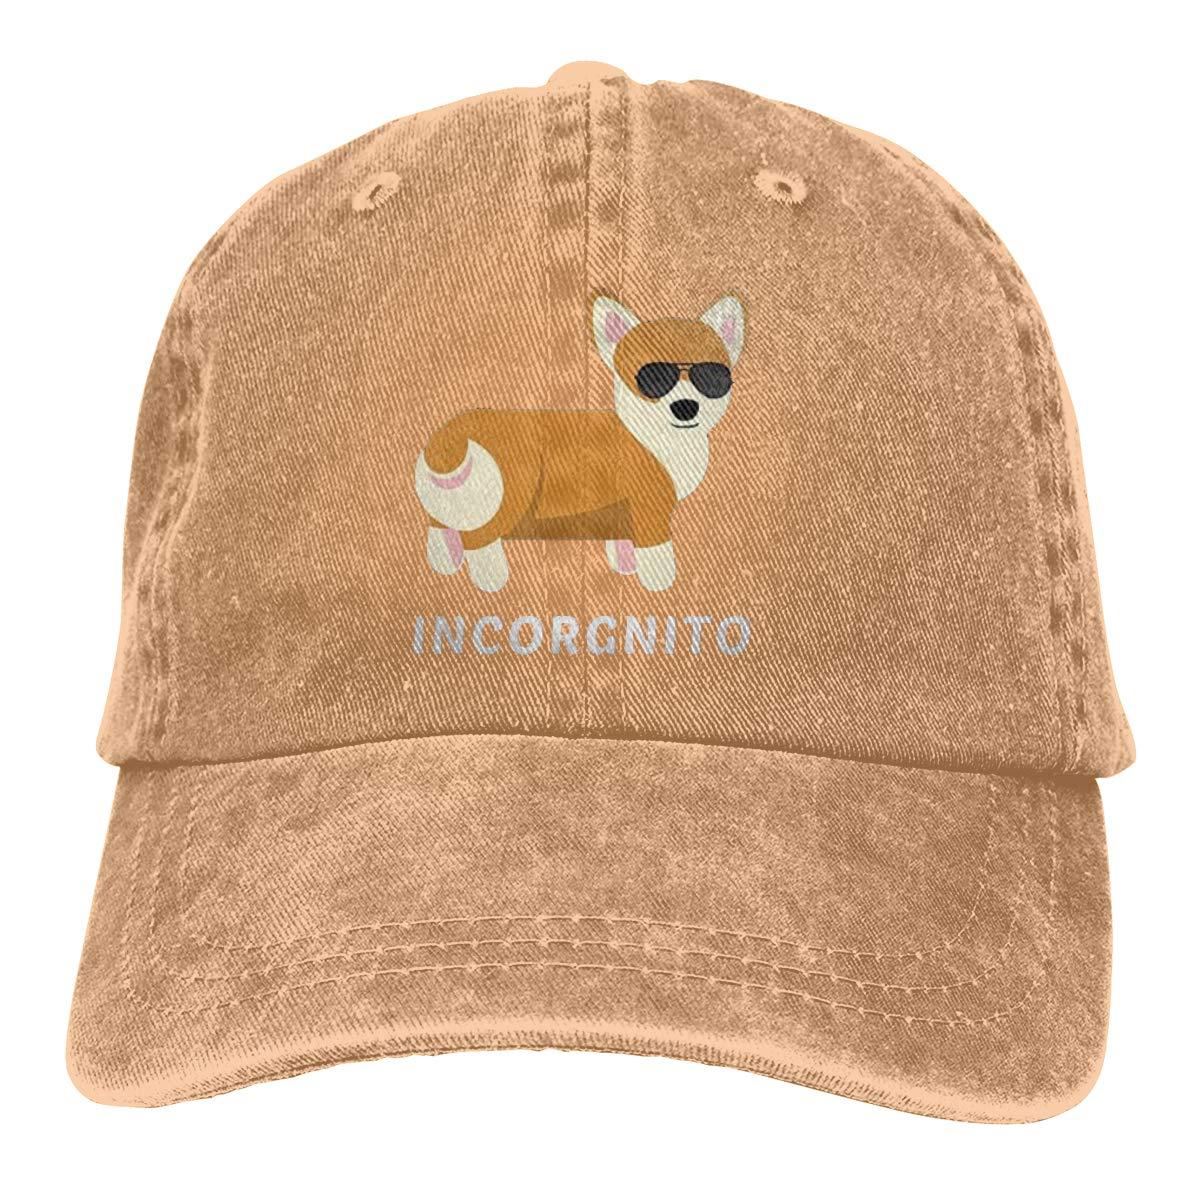 Funny Corgi Unisex Baseball Cap Cotton Denim Custom Personalized Adjustable Sun Hat for Men Women Youth